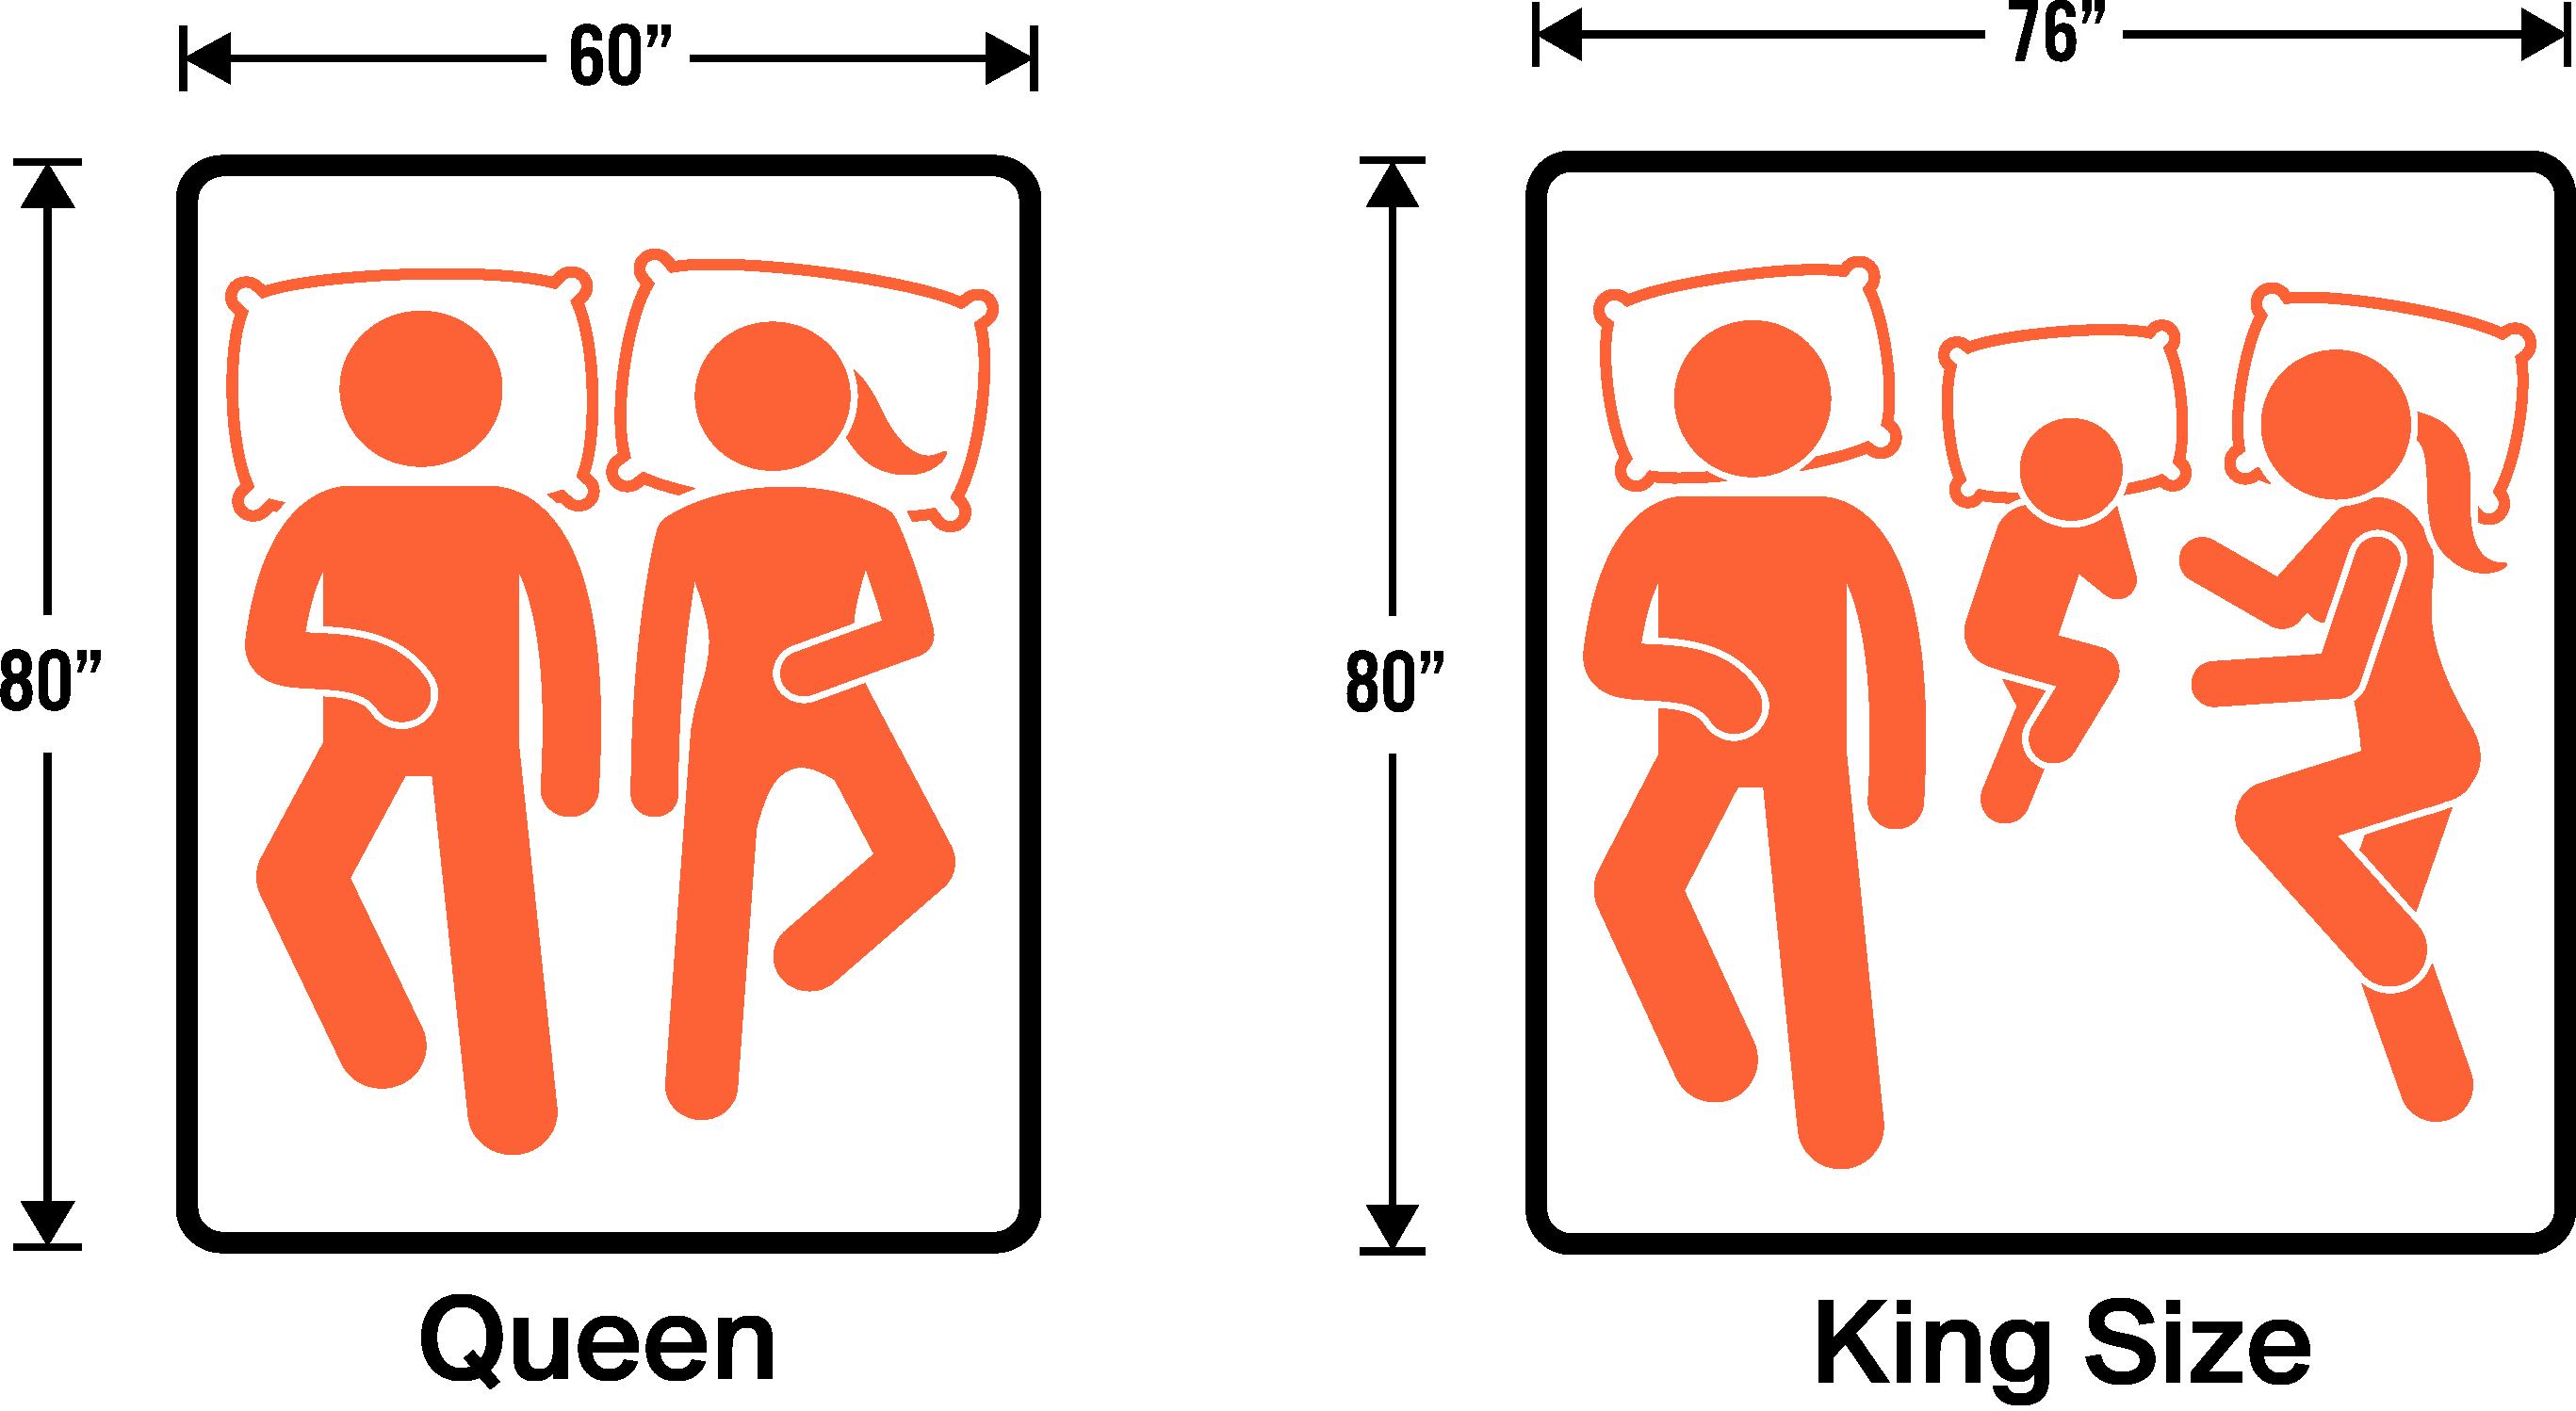 King vs Queen Dimensions